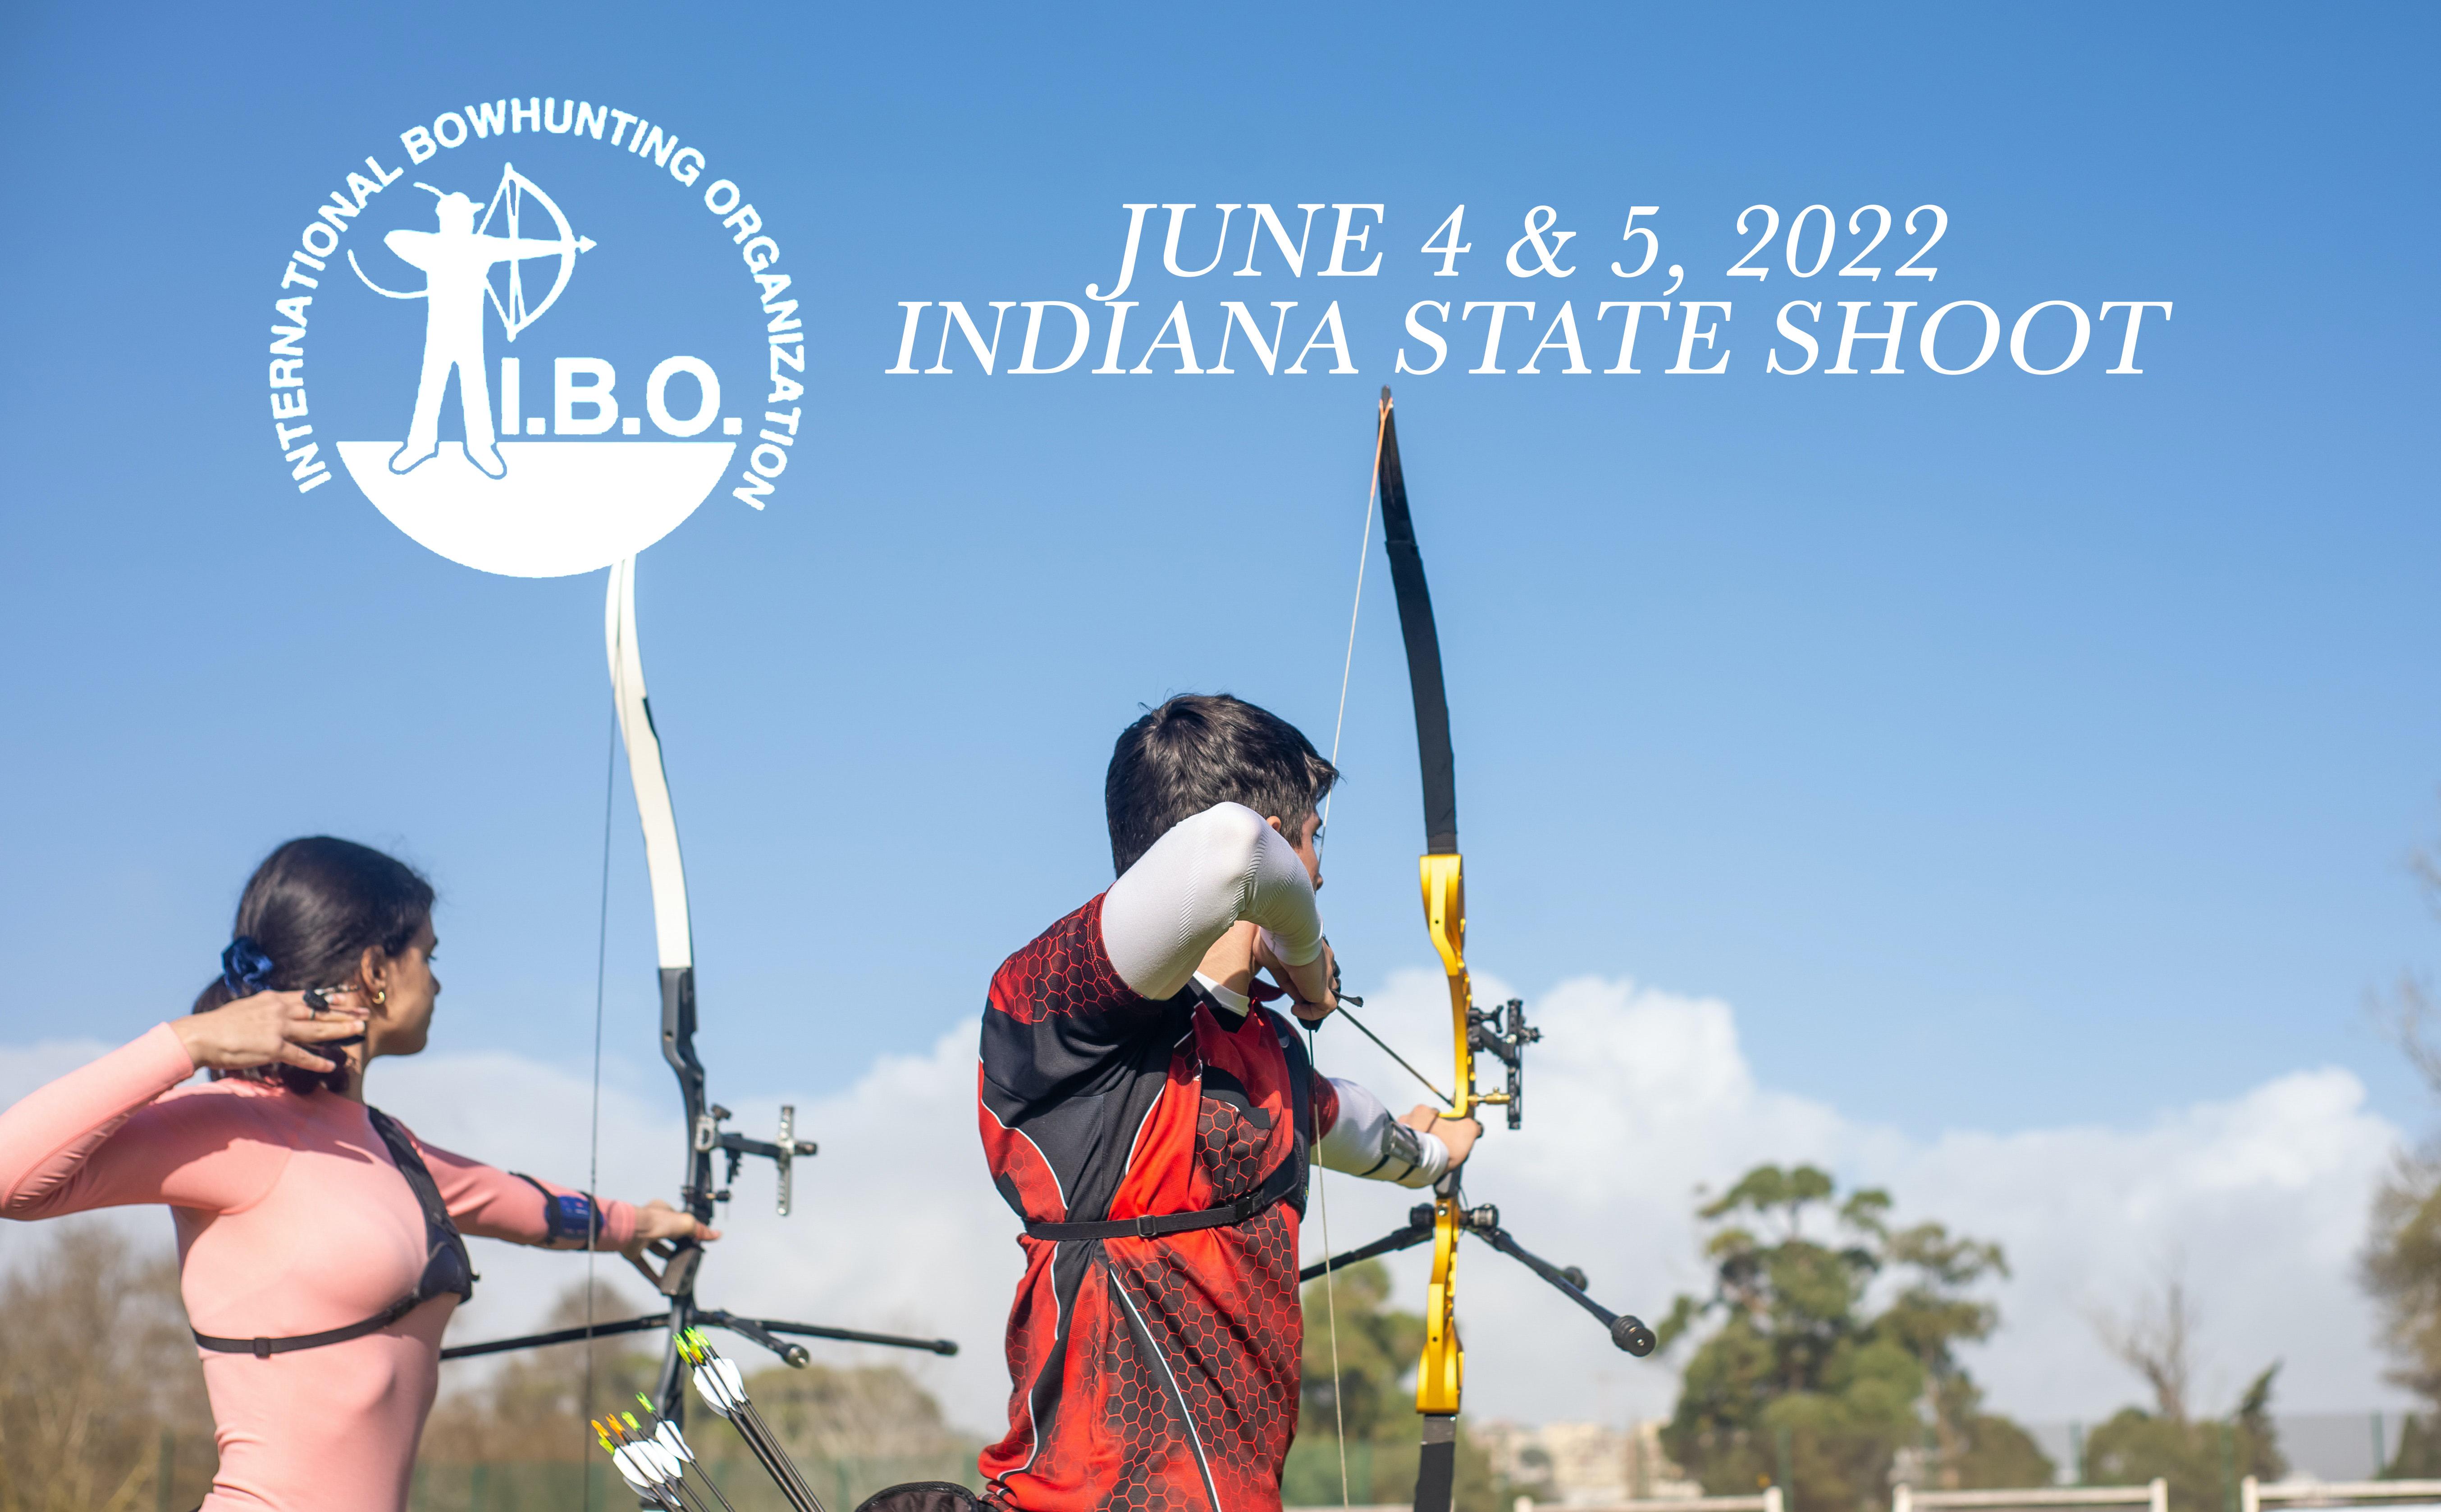 IBO INDIANA STATE SHOOT